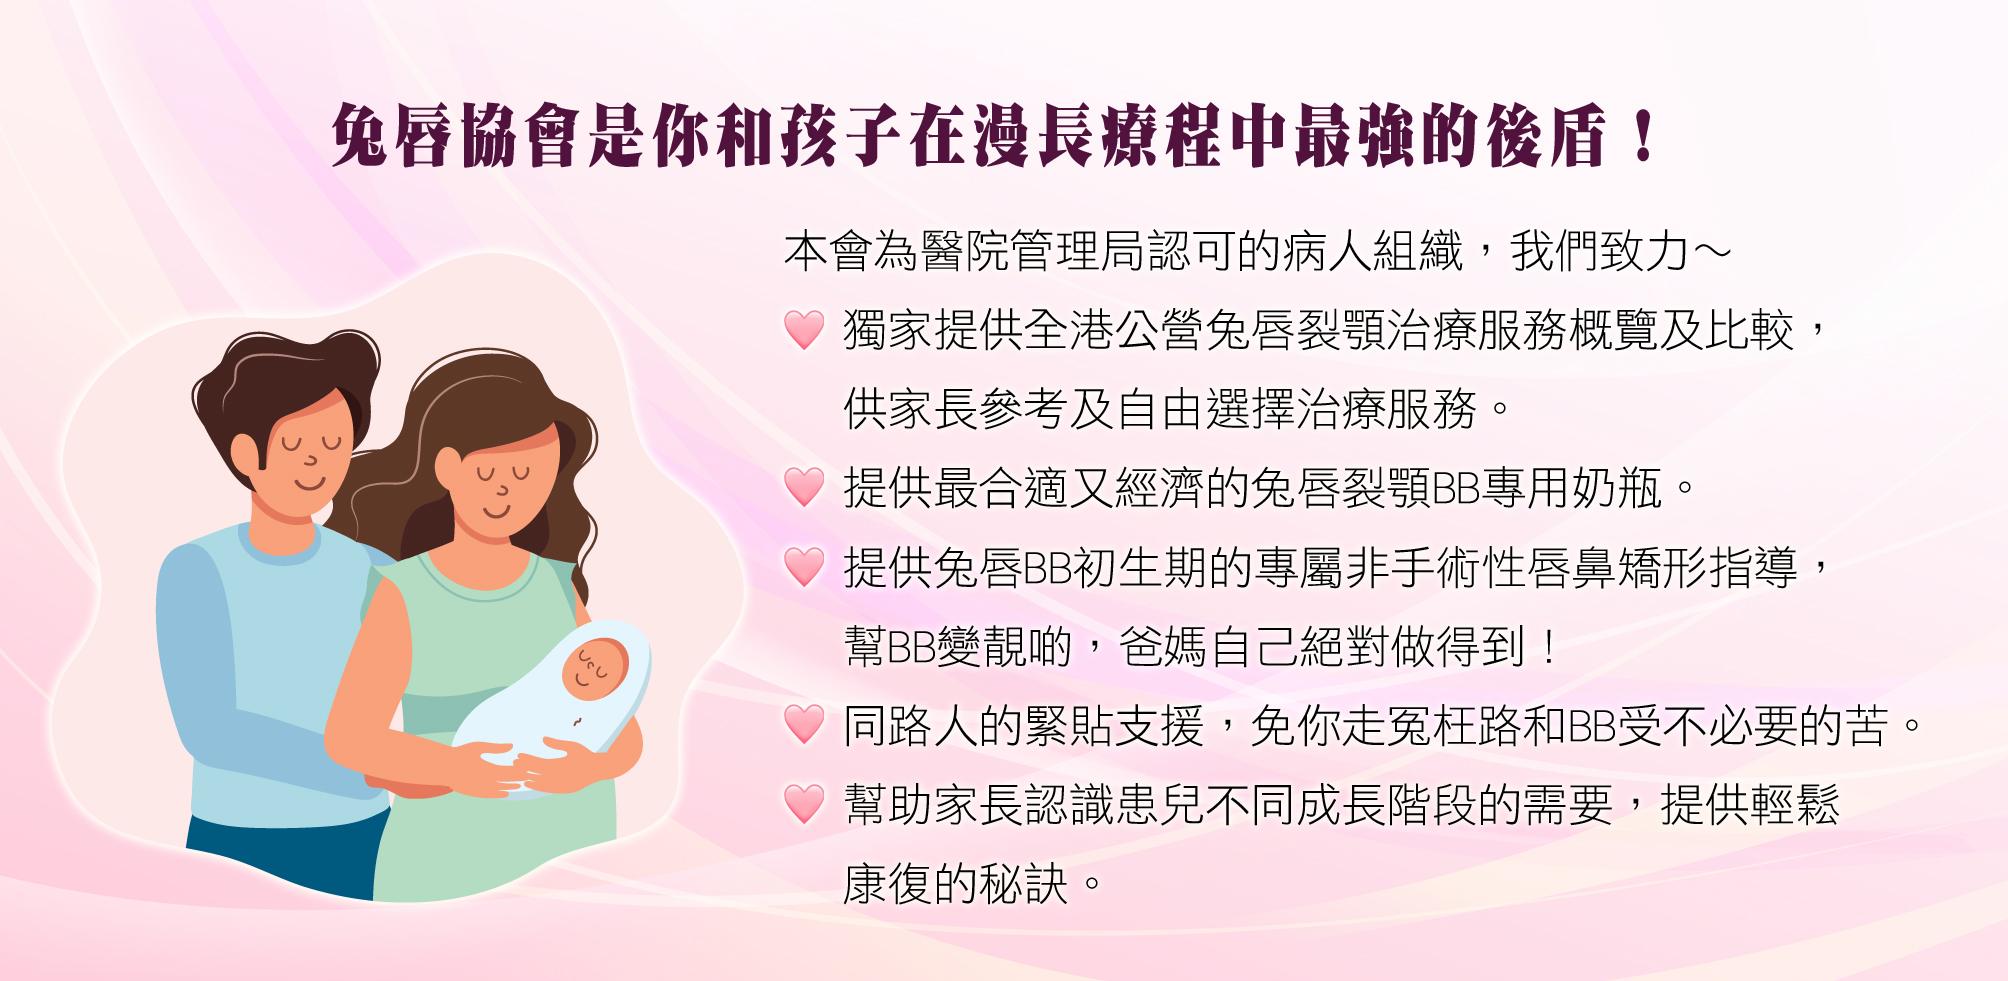 https://www.cleftlip.org.hk/wp-content/uploads/2021/01/2021.1.20_懷孕家長_banner_desktop1-copy-1.jpg